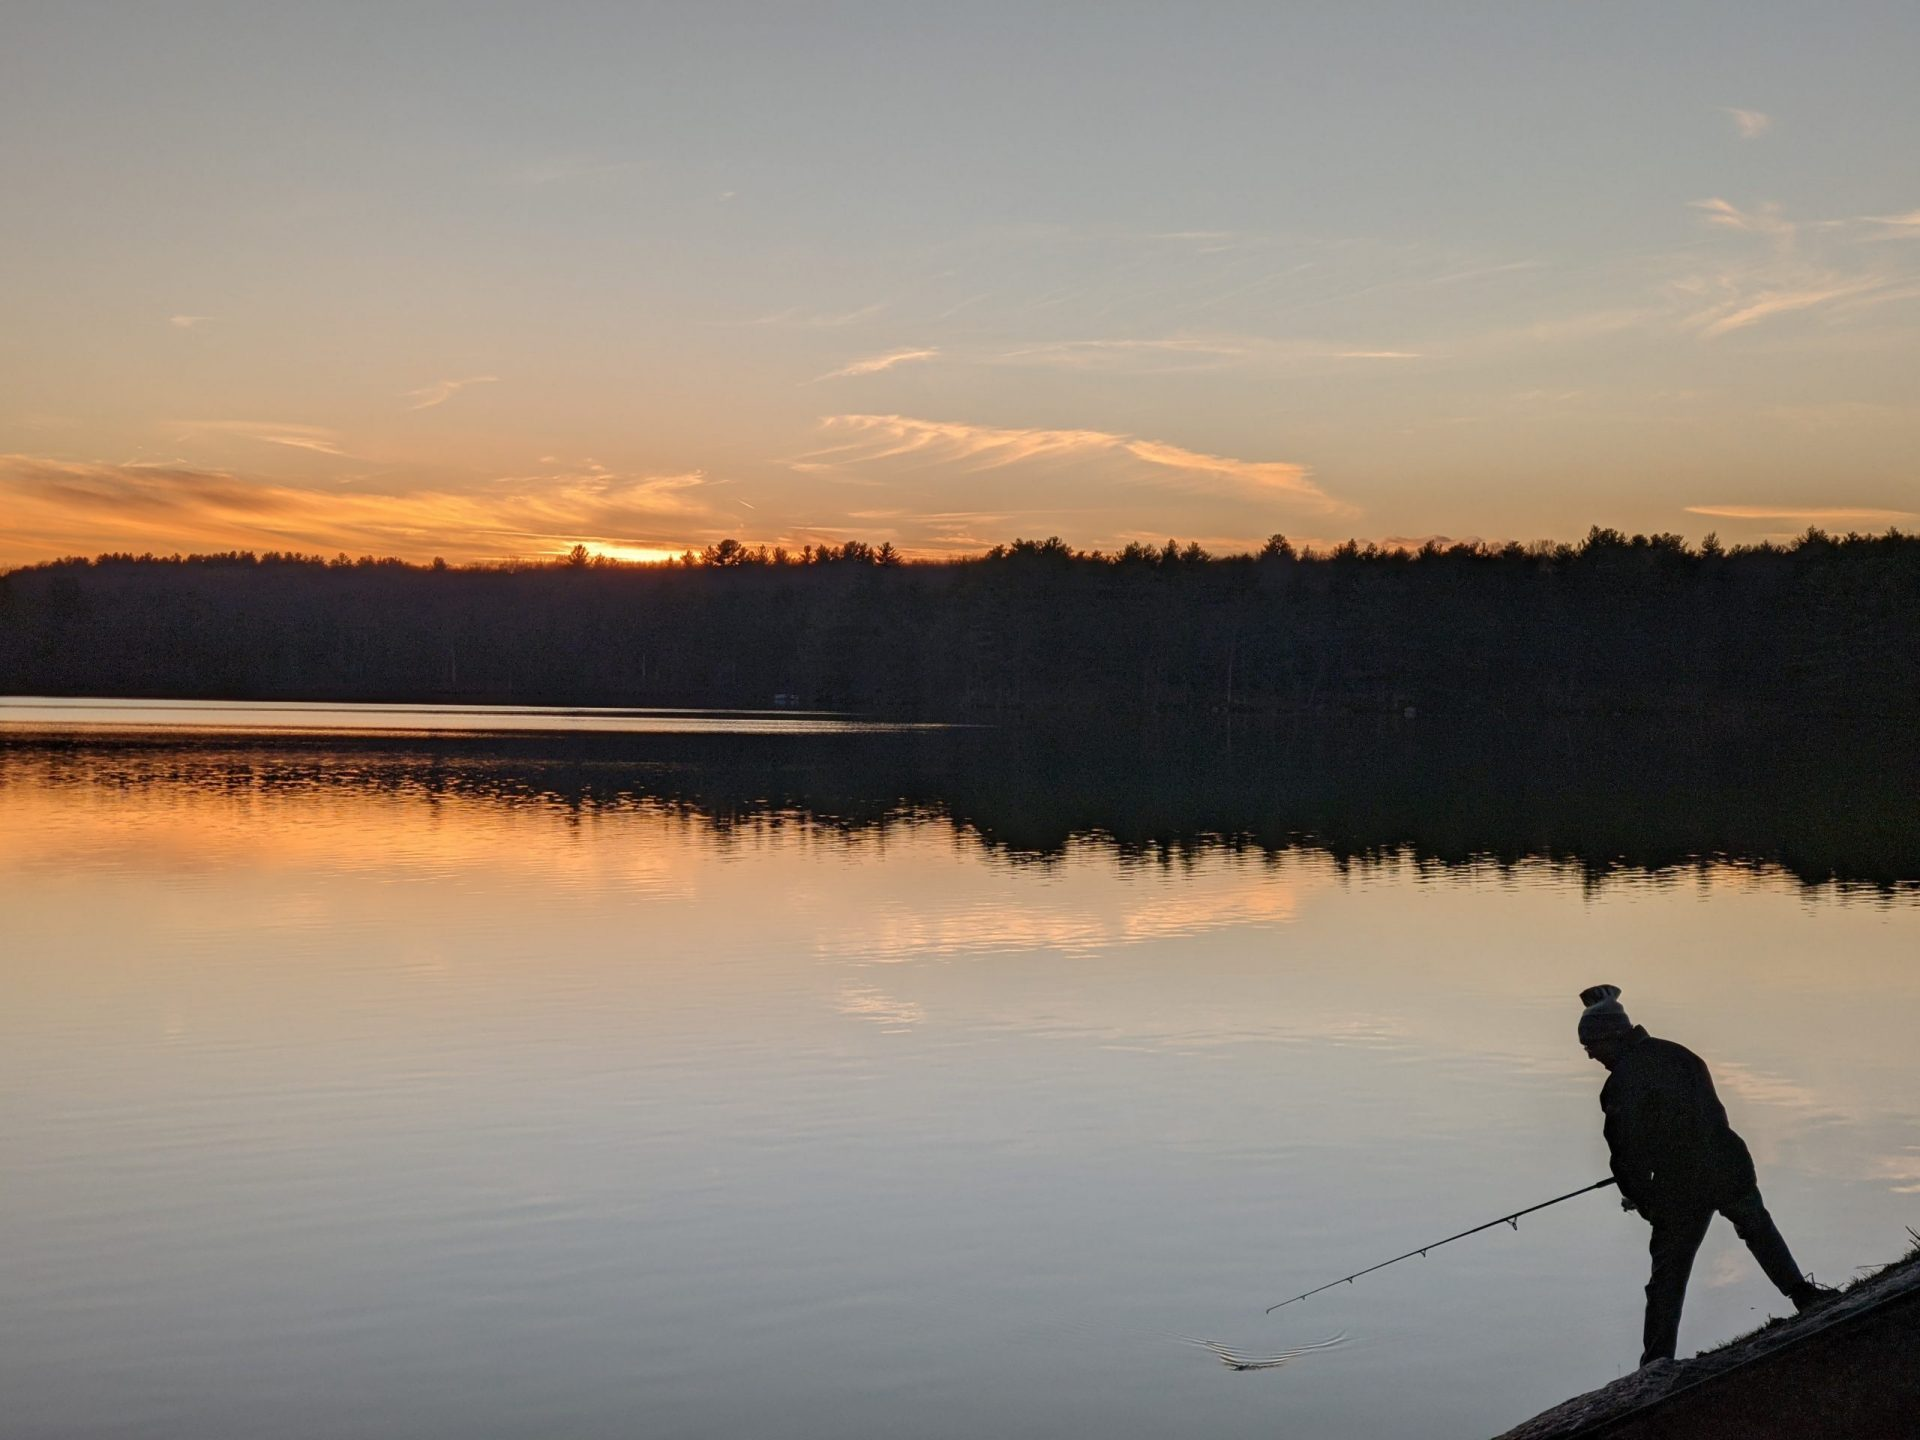 Fisherman in silhouette - sunset Ashland State Park November 2020